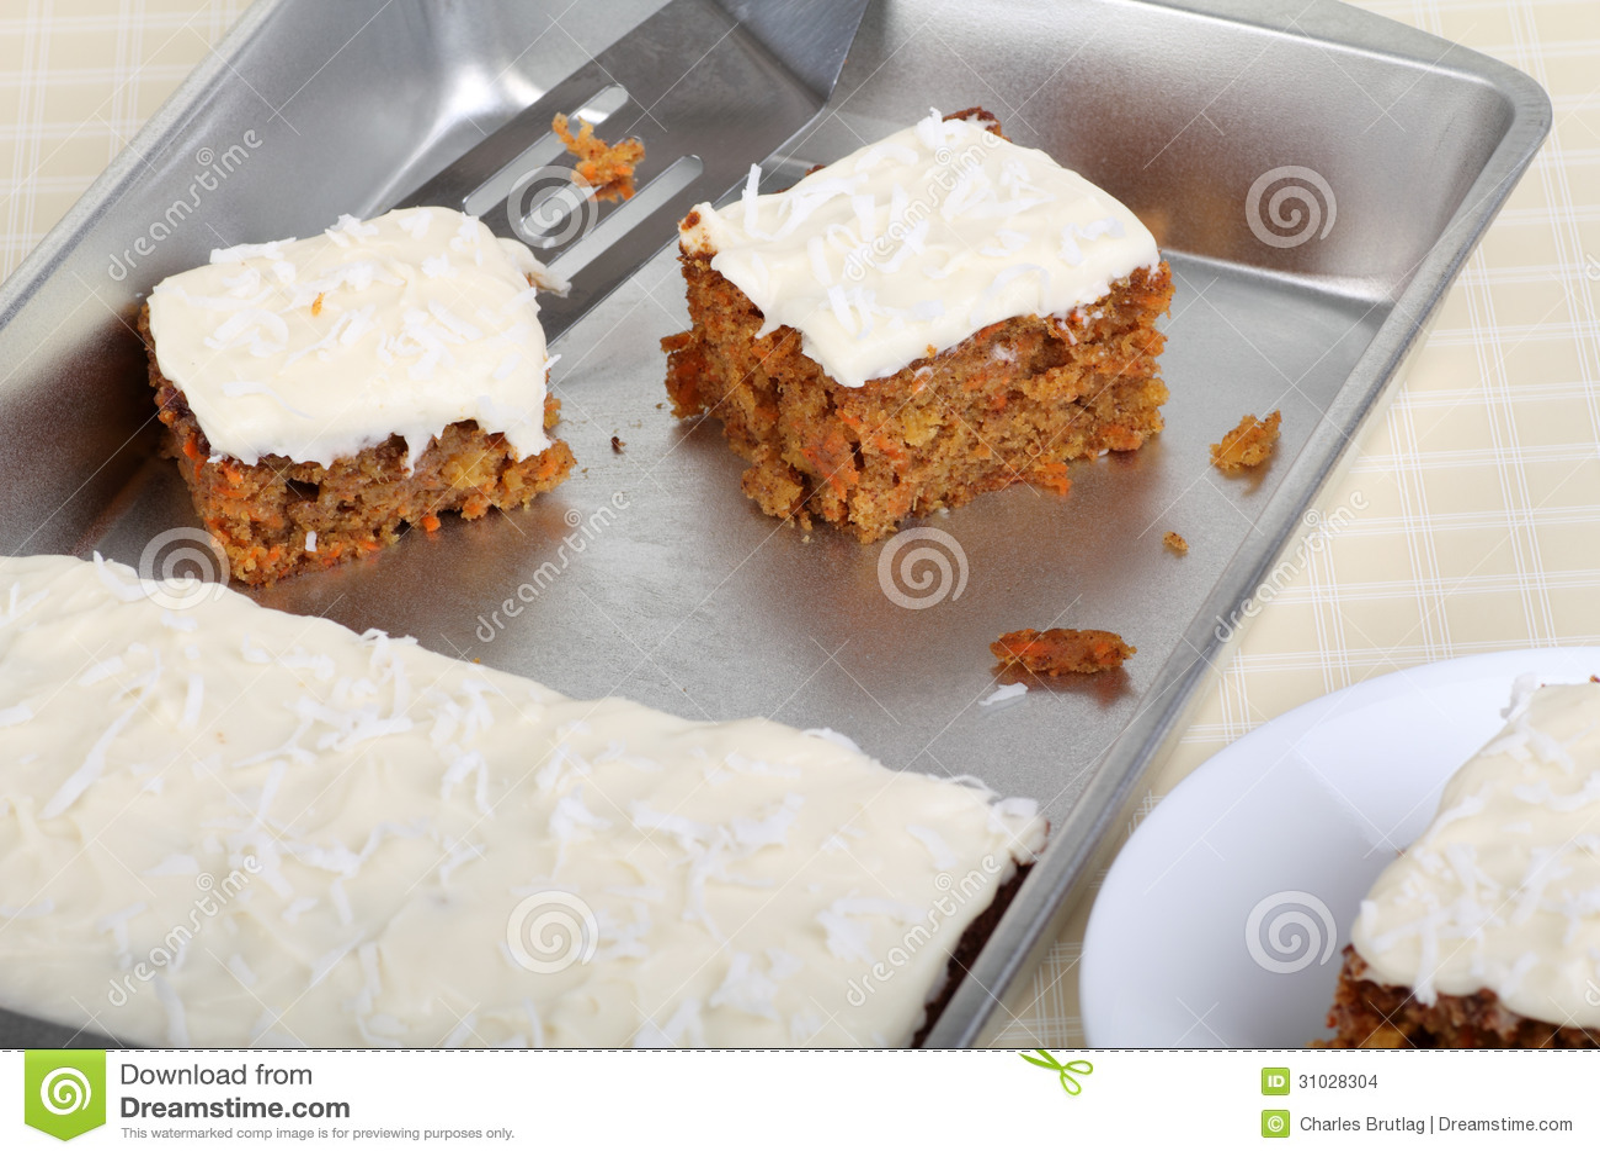 Pieces od Carrot Cake